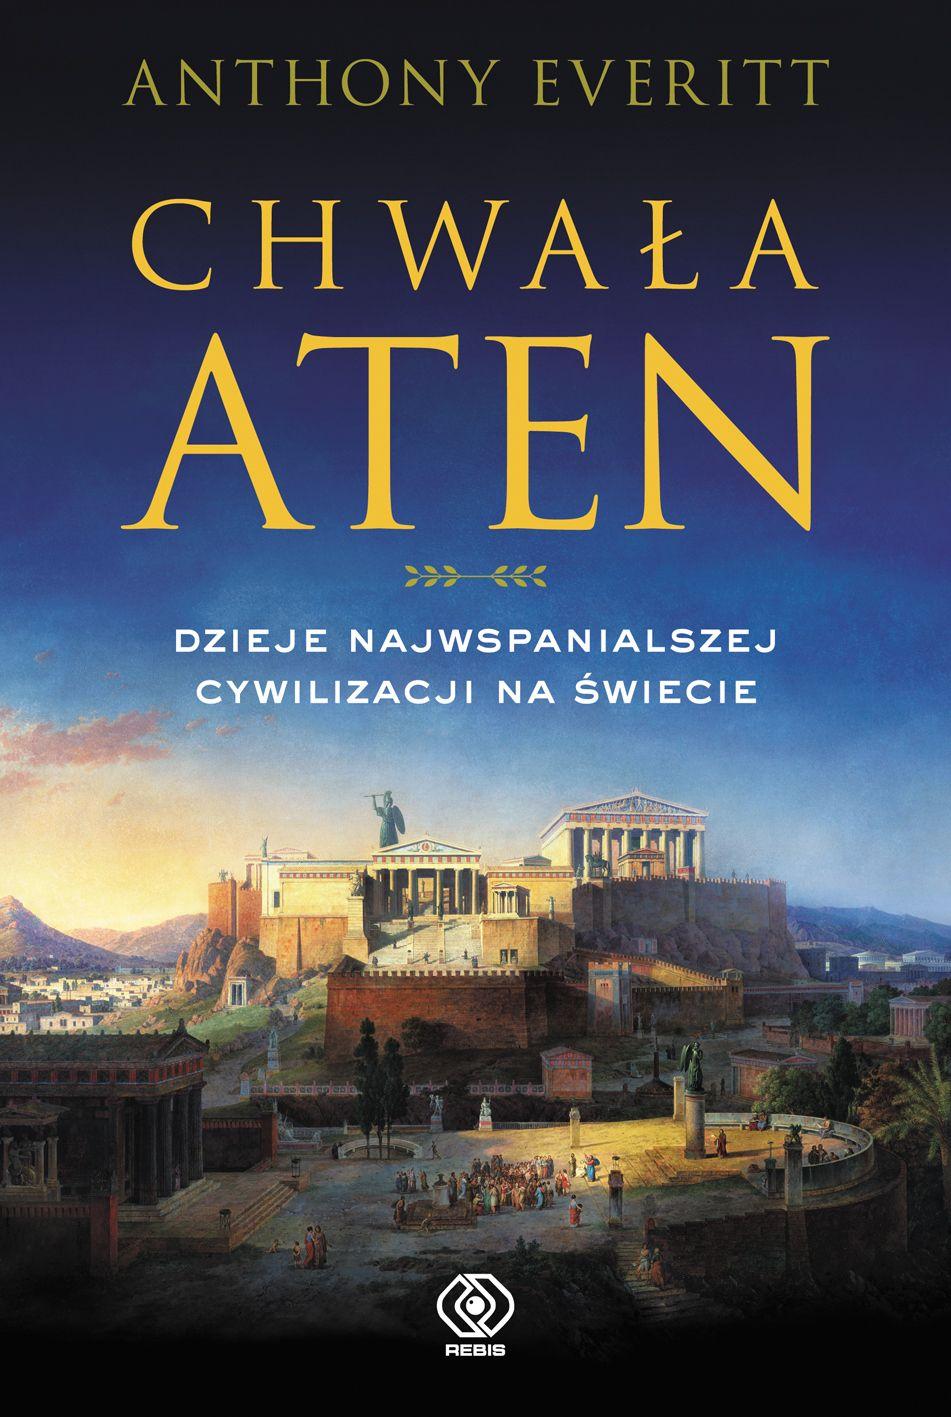 Kup książkę Anthony'egp Everitta z rabatem na empik.com